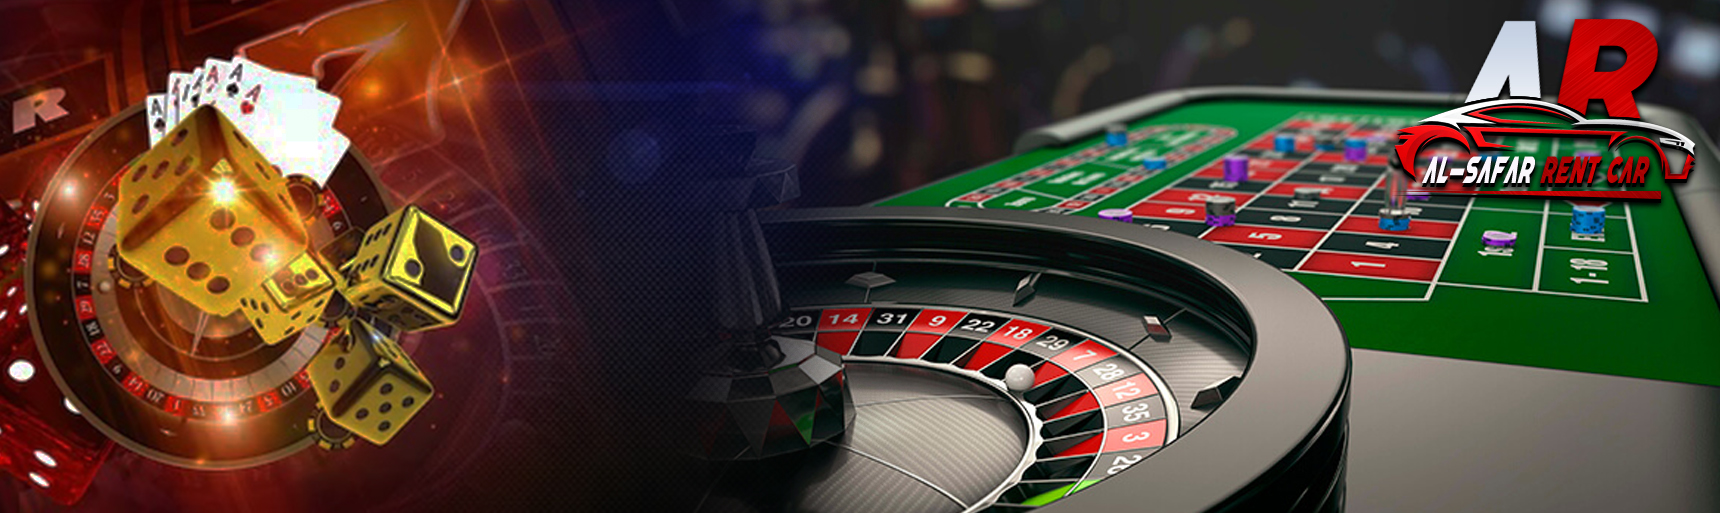 Apk Casino di Android